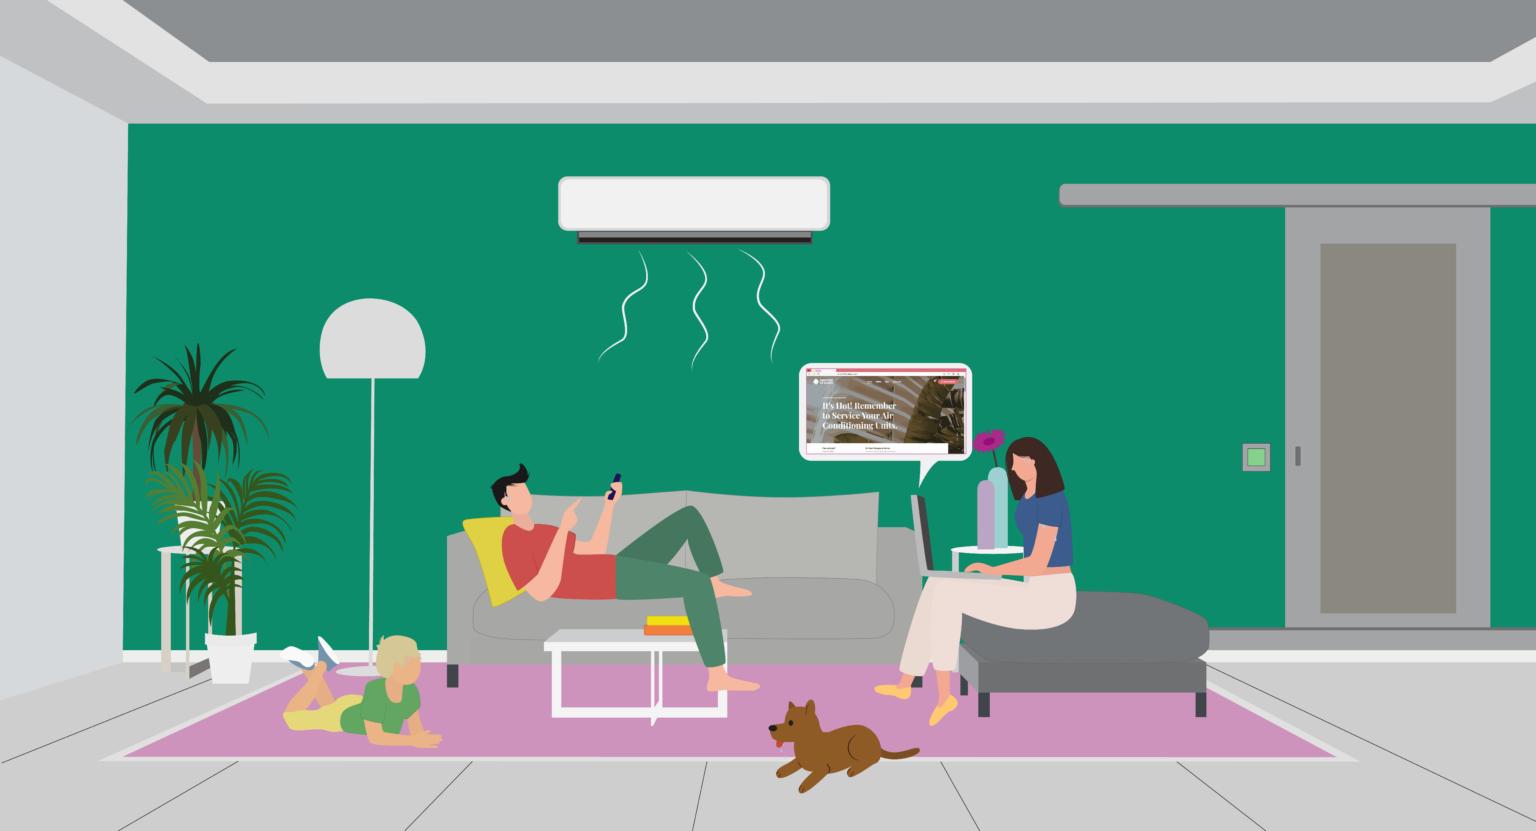 Booking AC Service illustration